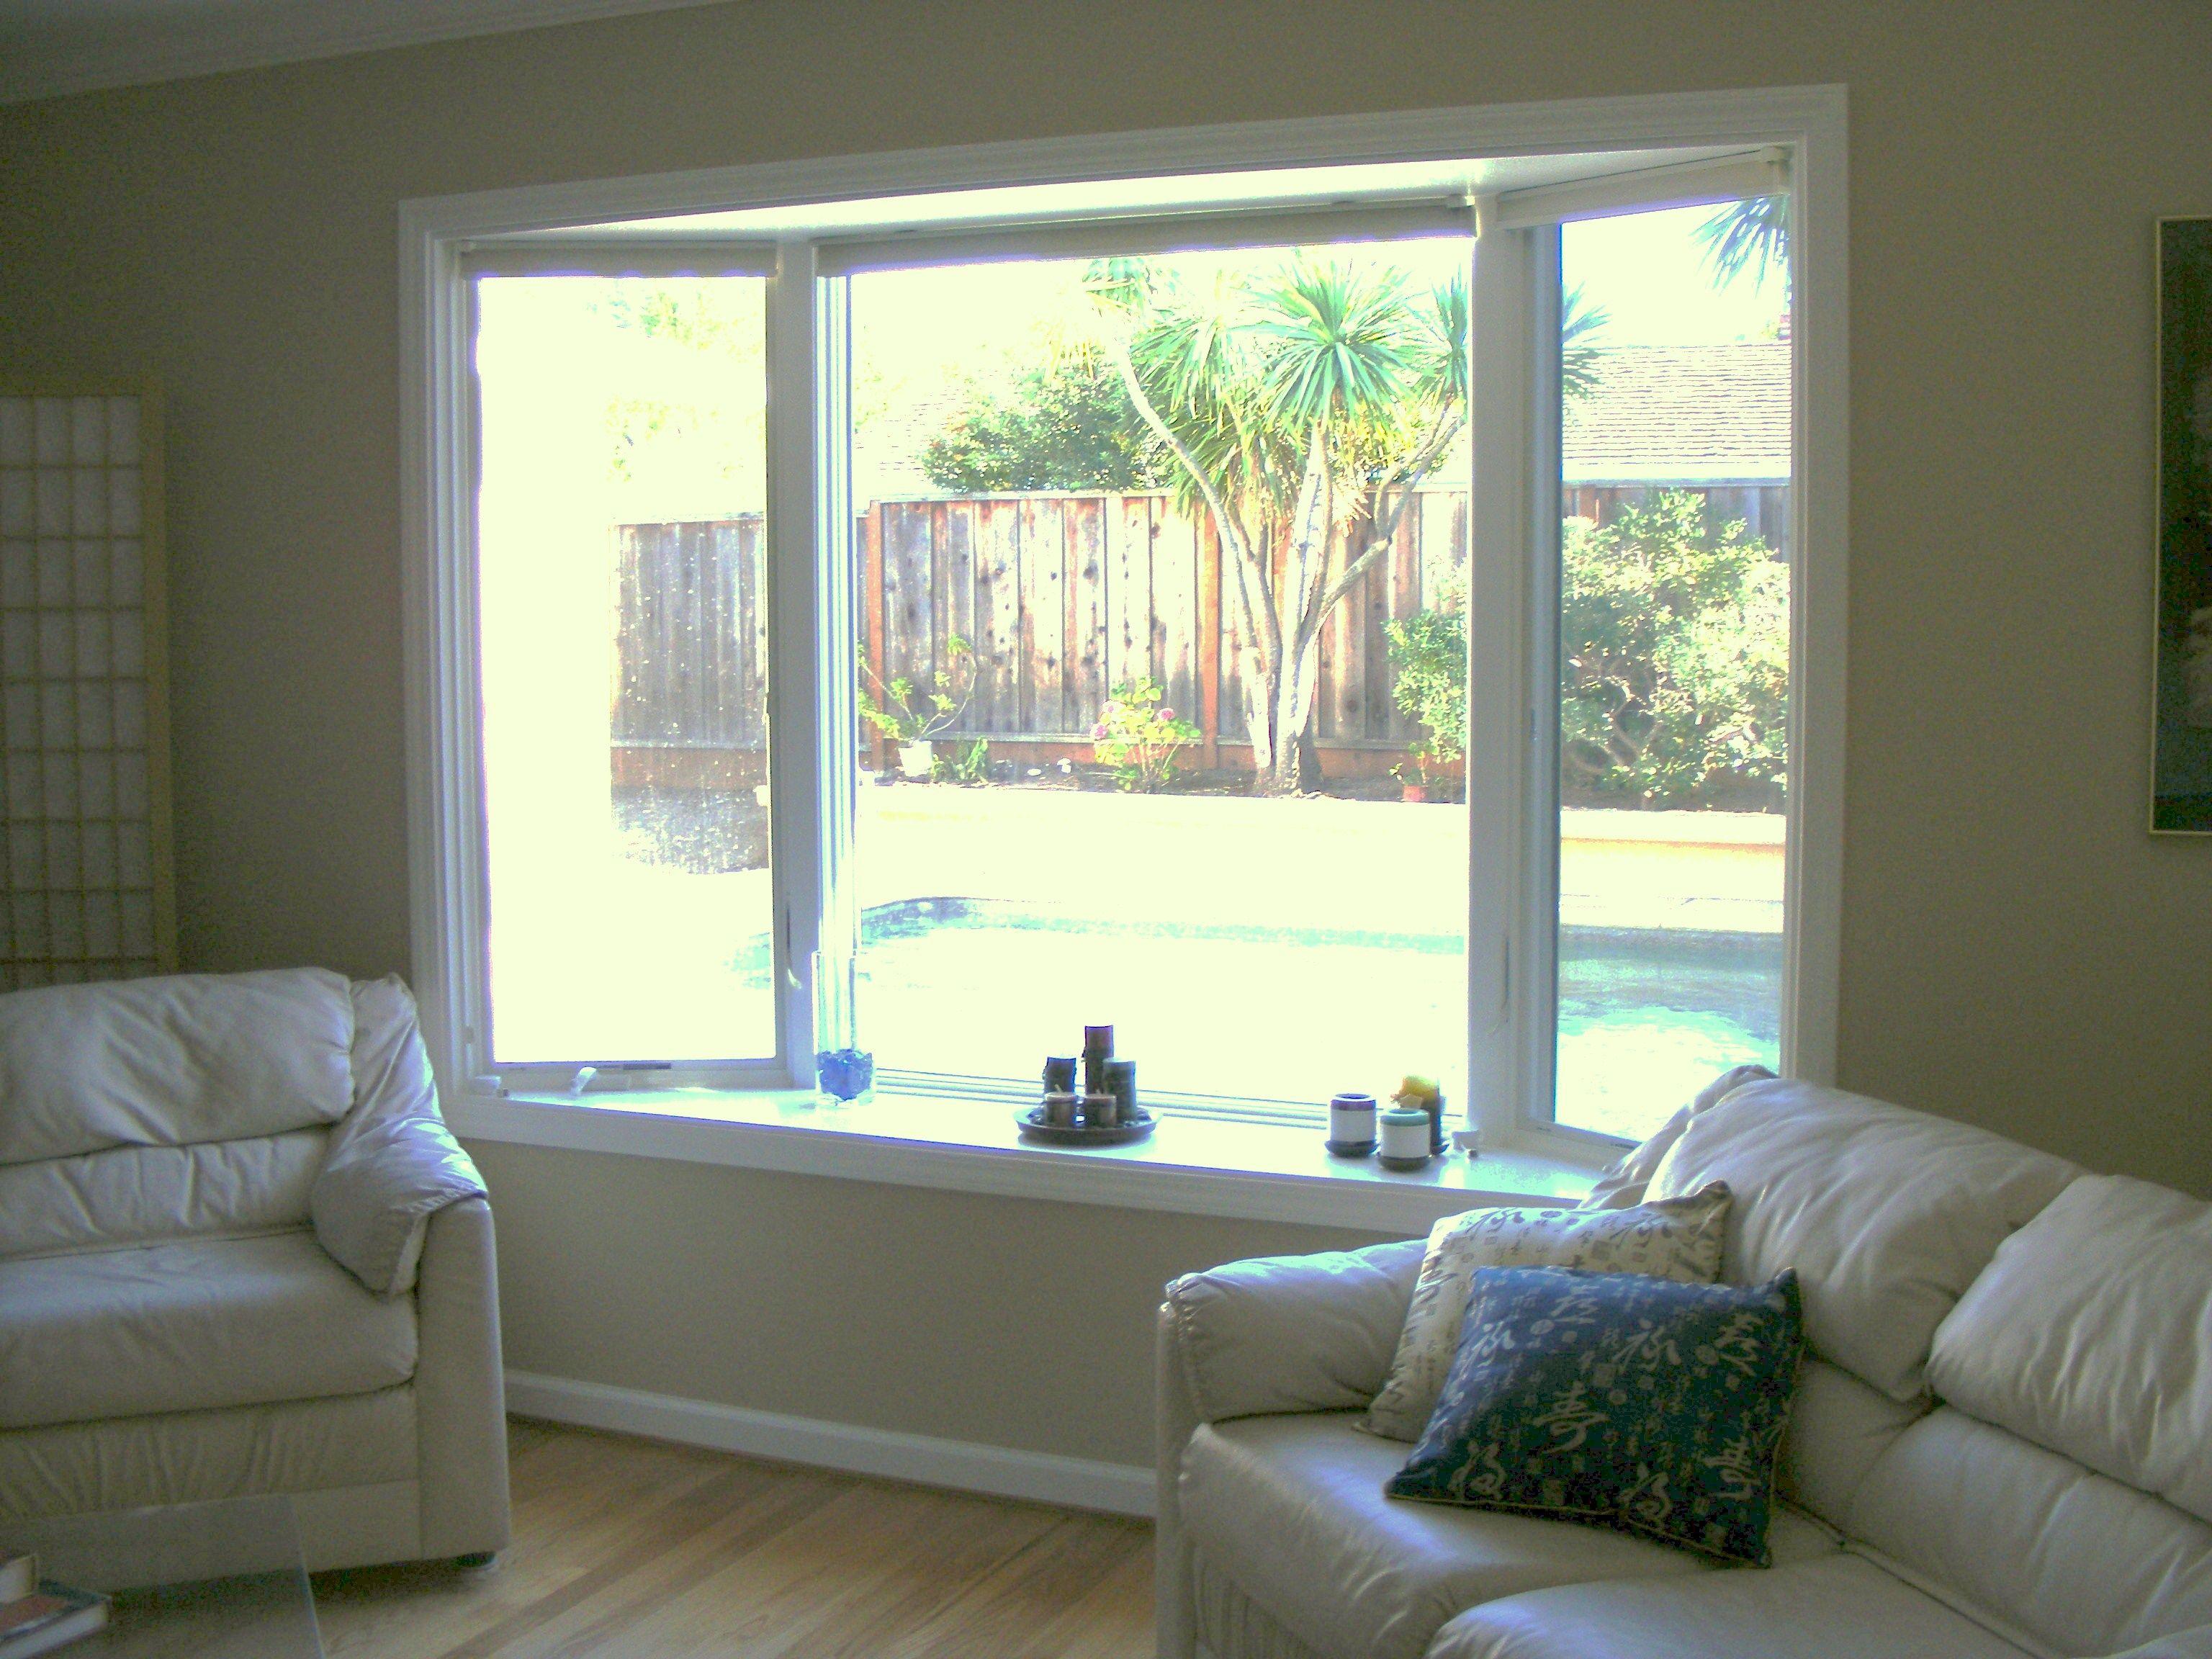 inspiring living room window treatment ideas | Accessories & Furniture,Inspiring Living Room Bay Window ...